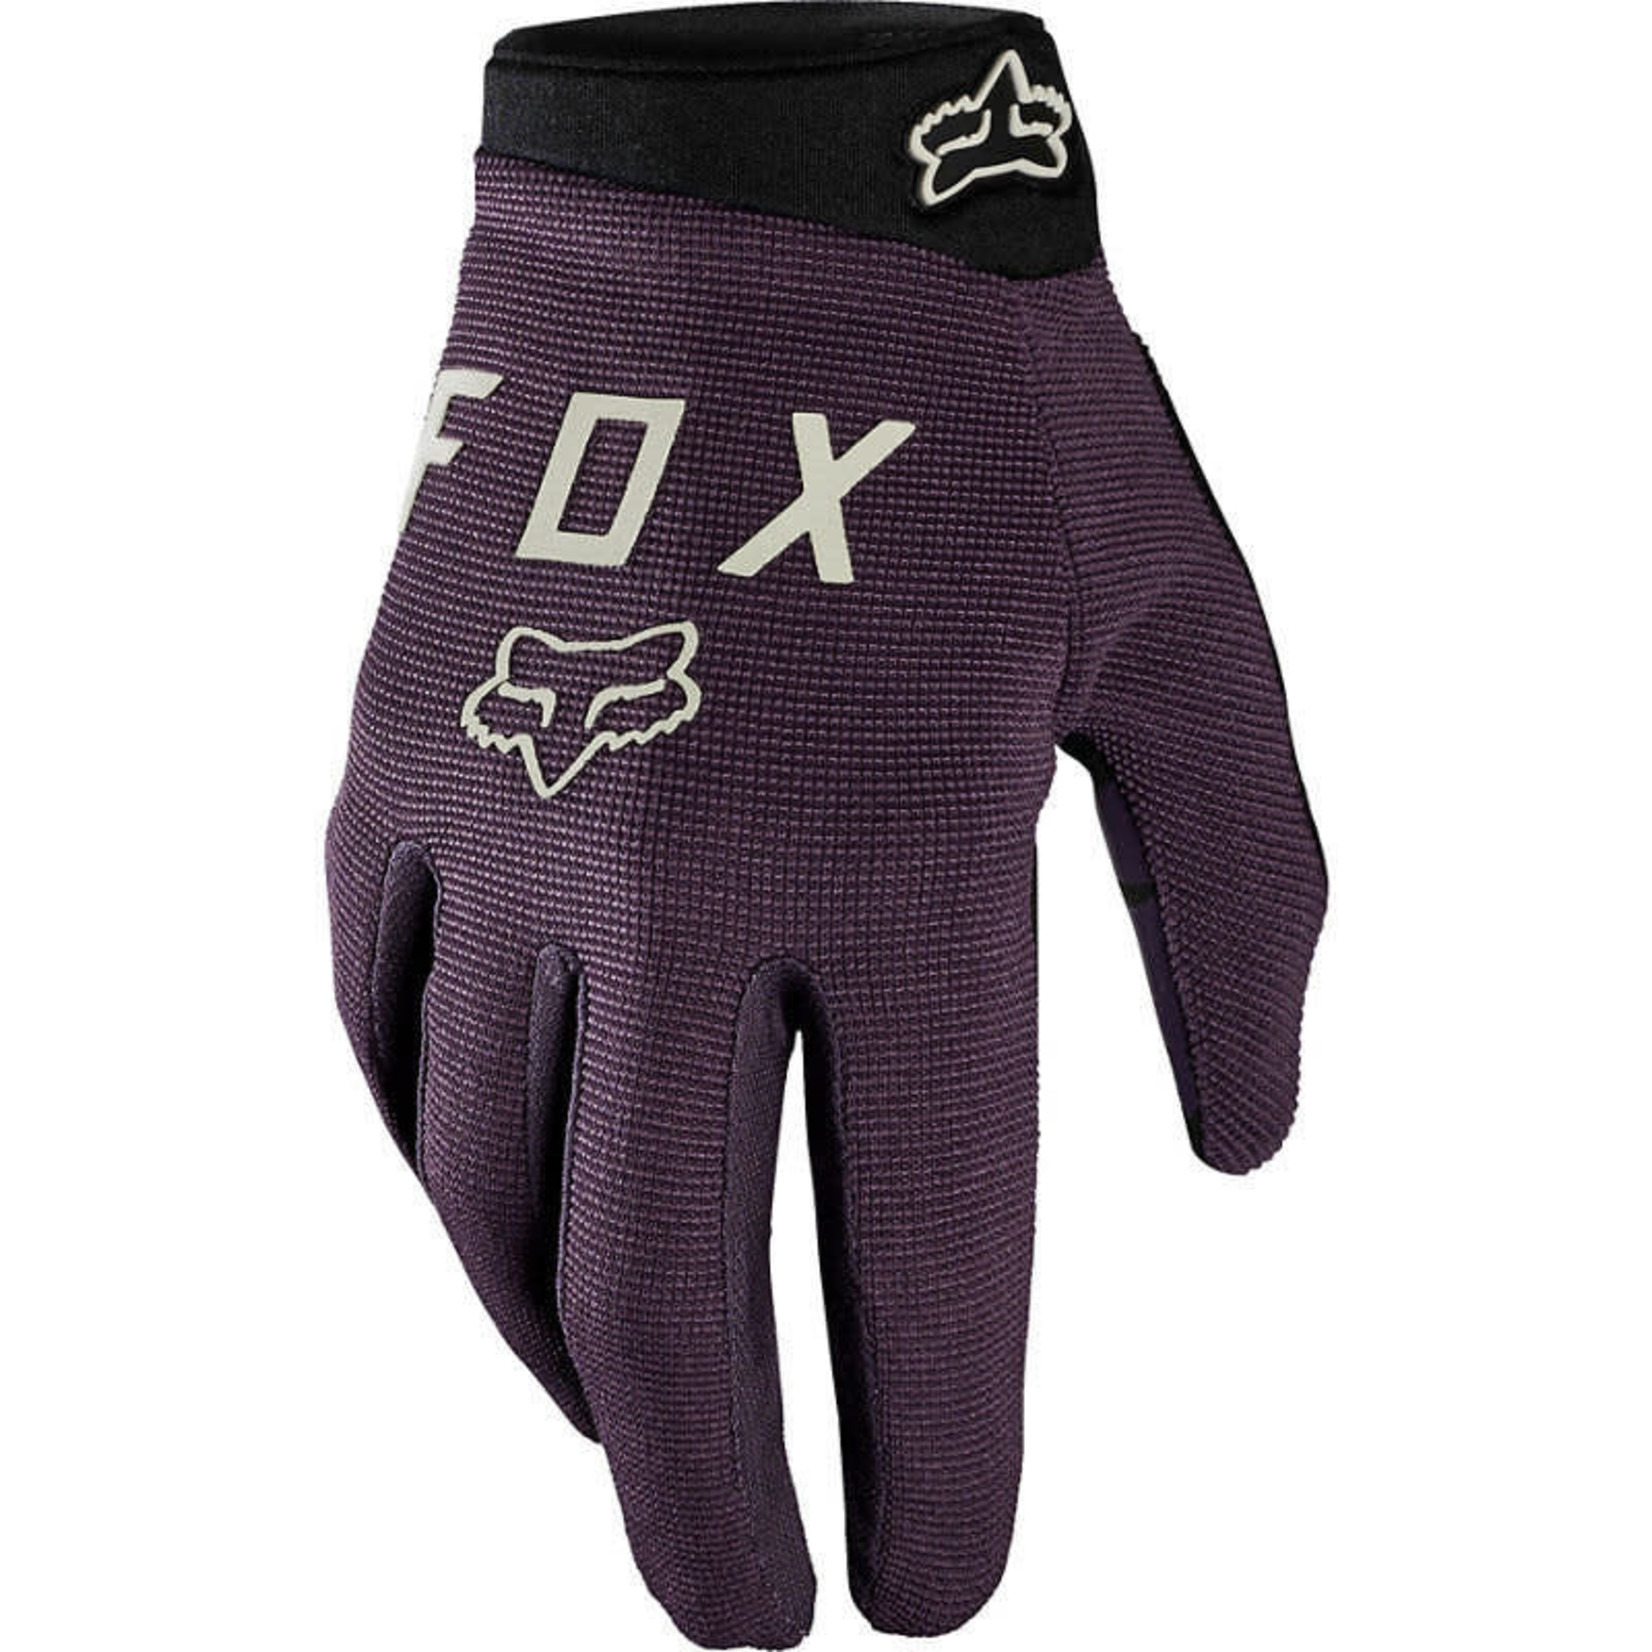 Fox Fox Glove Ranger womens medium